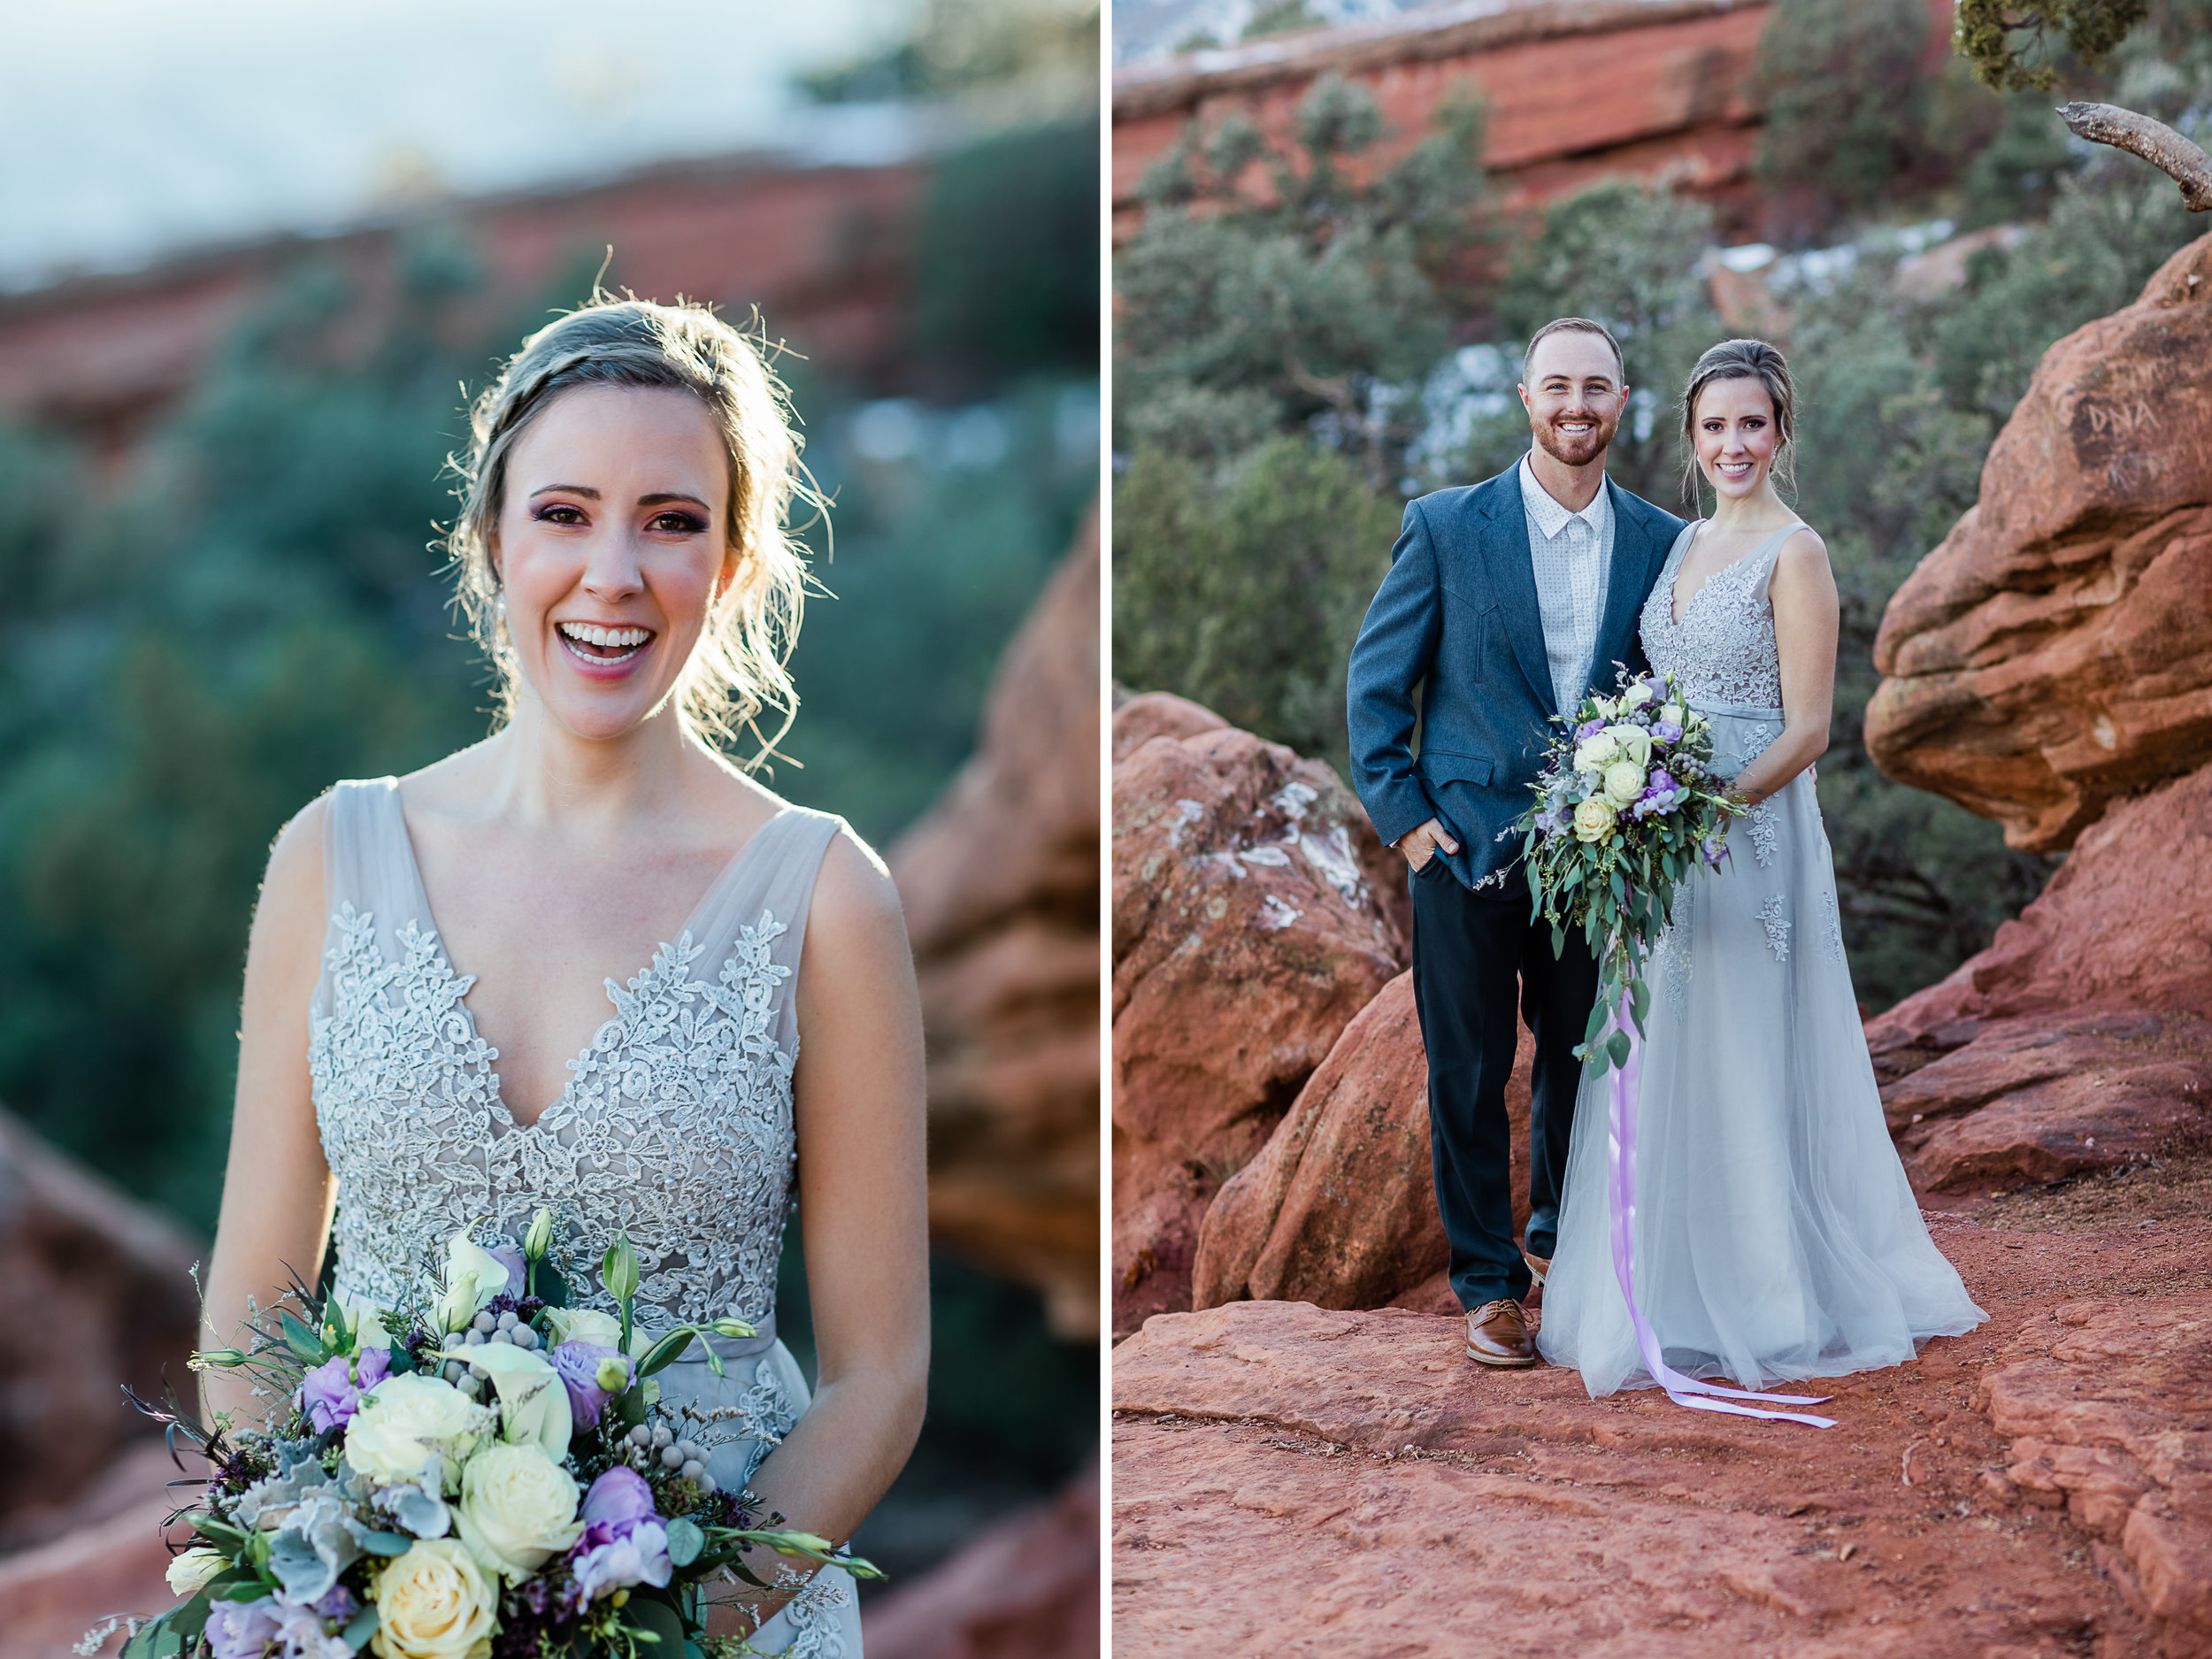 Colorado Springs Wedding Photographer 3.jpg